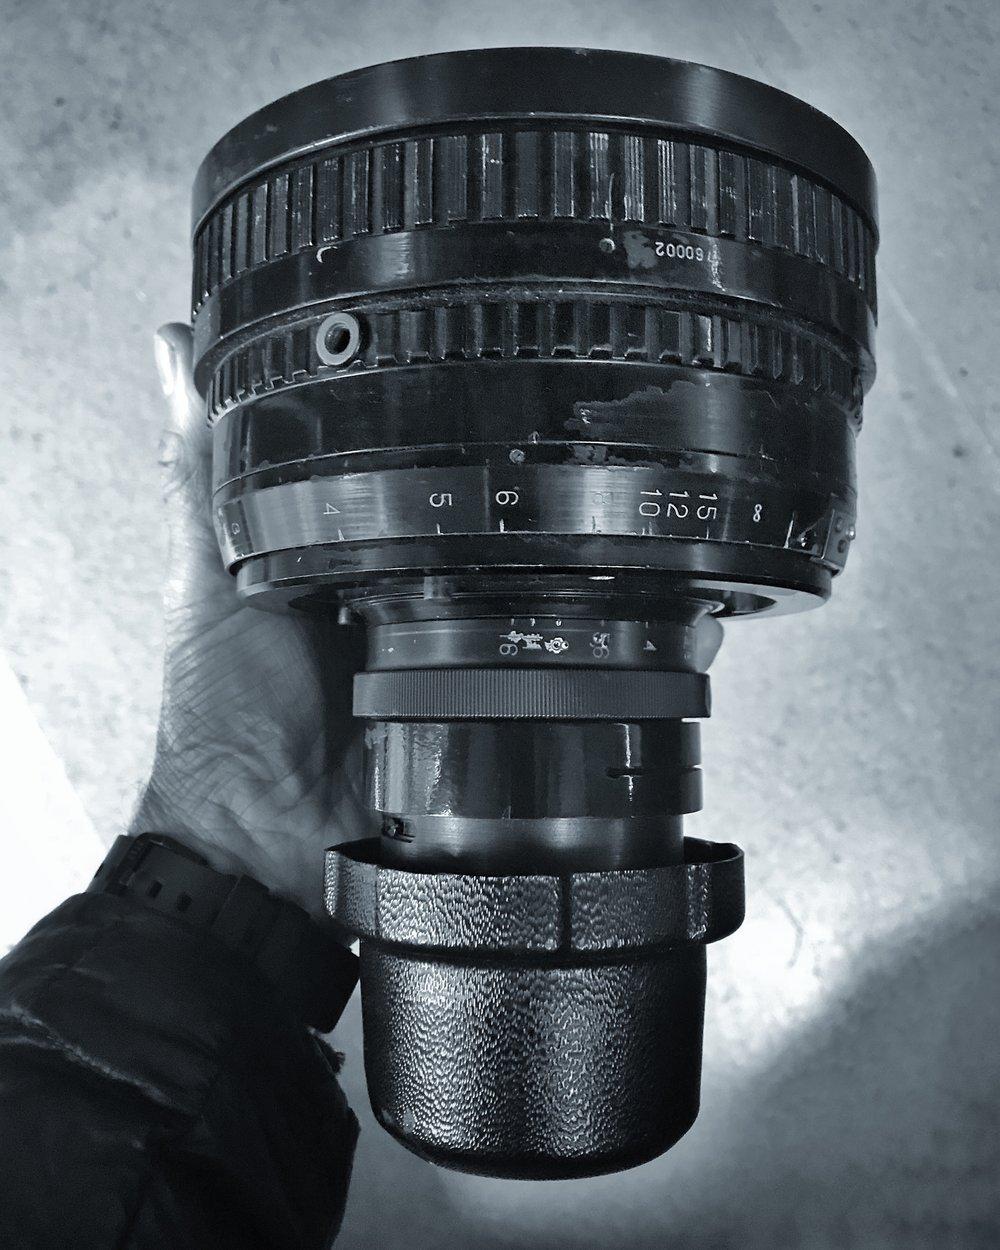 Lomo Round Front Anamorphic 35mm